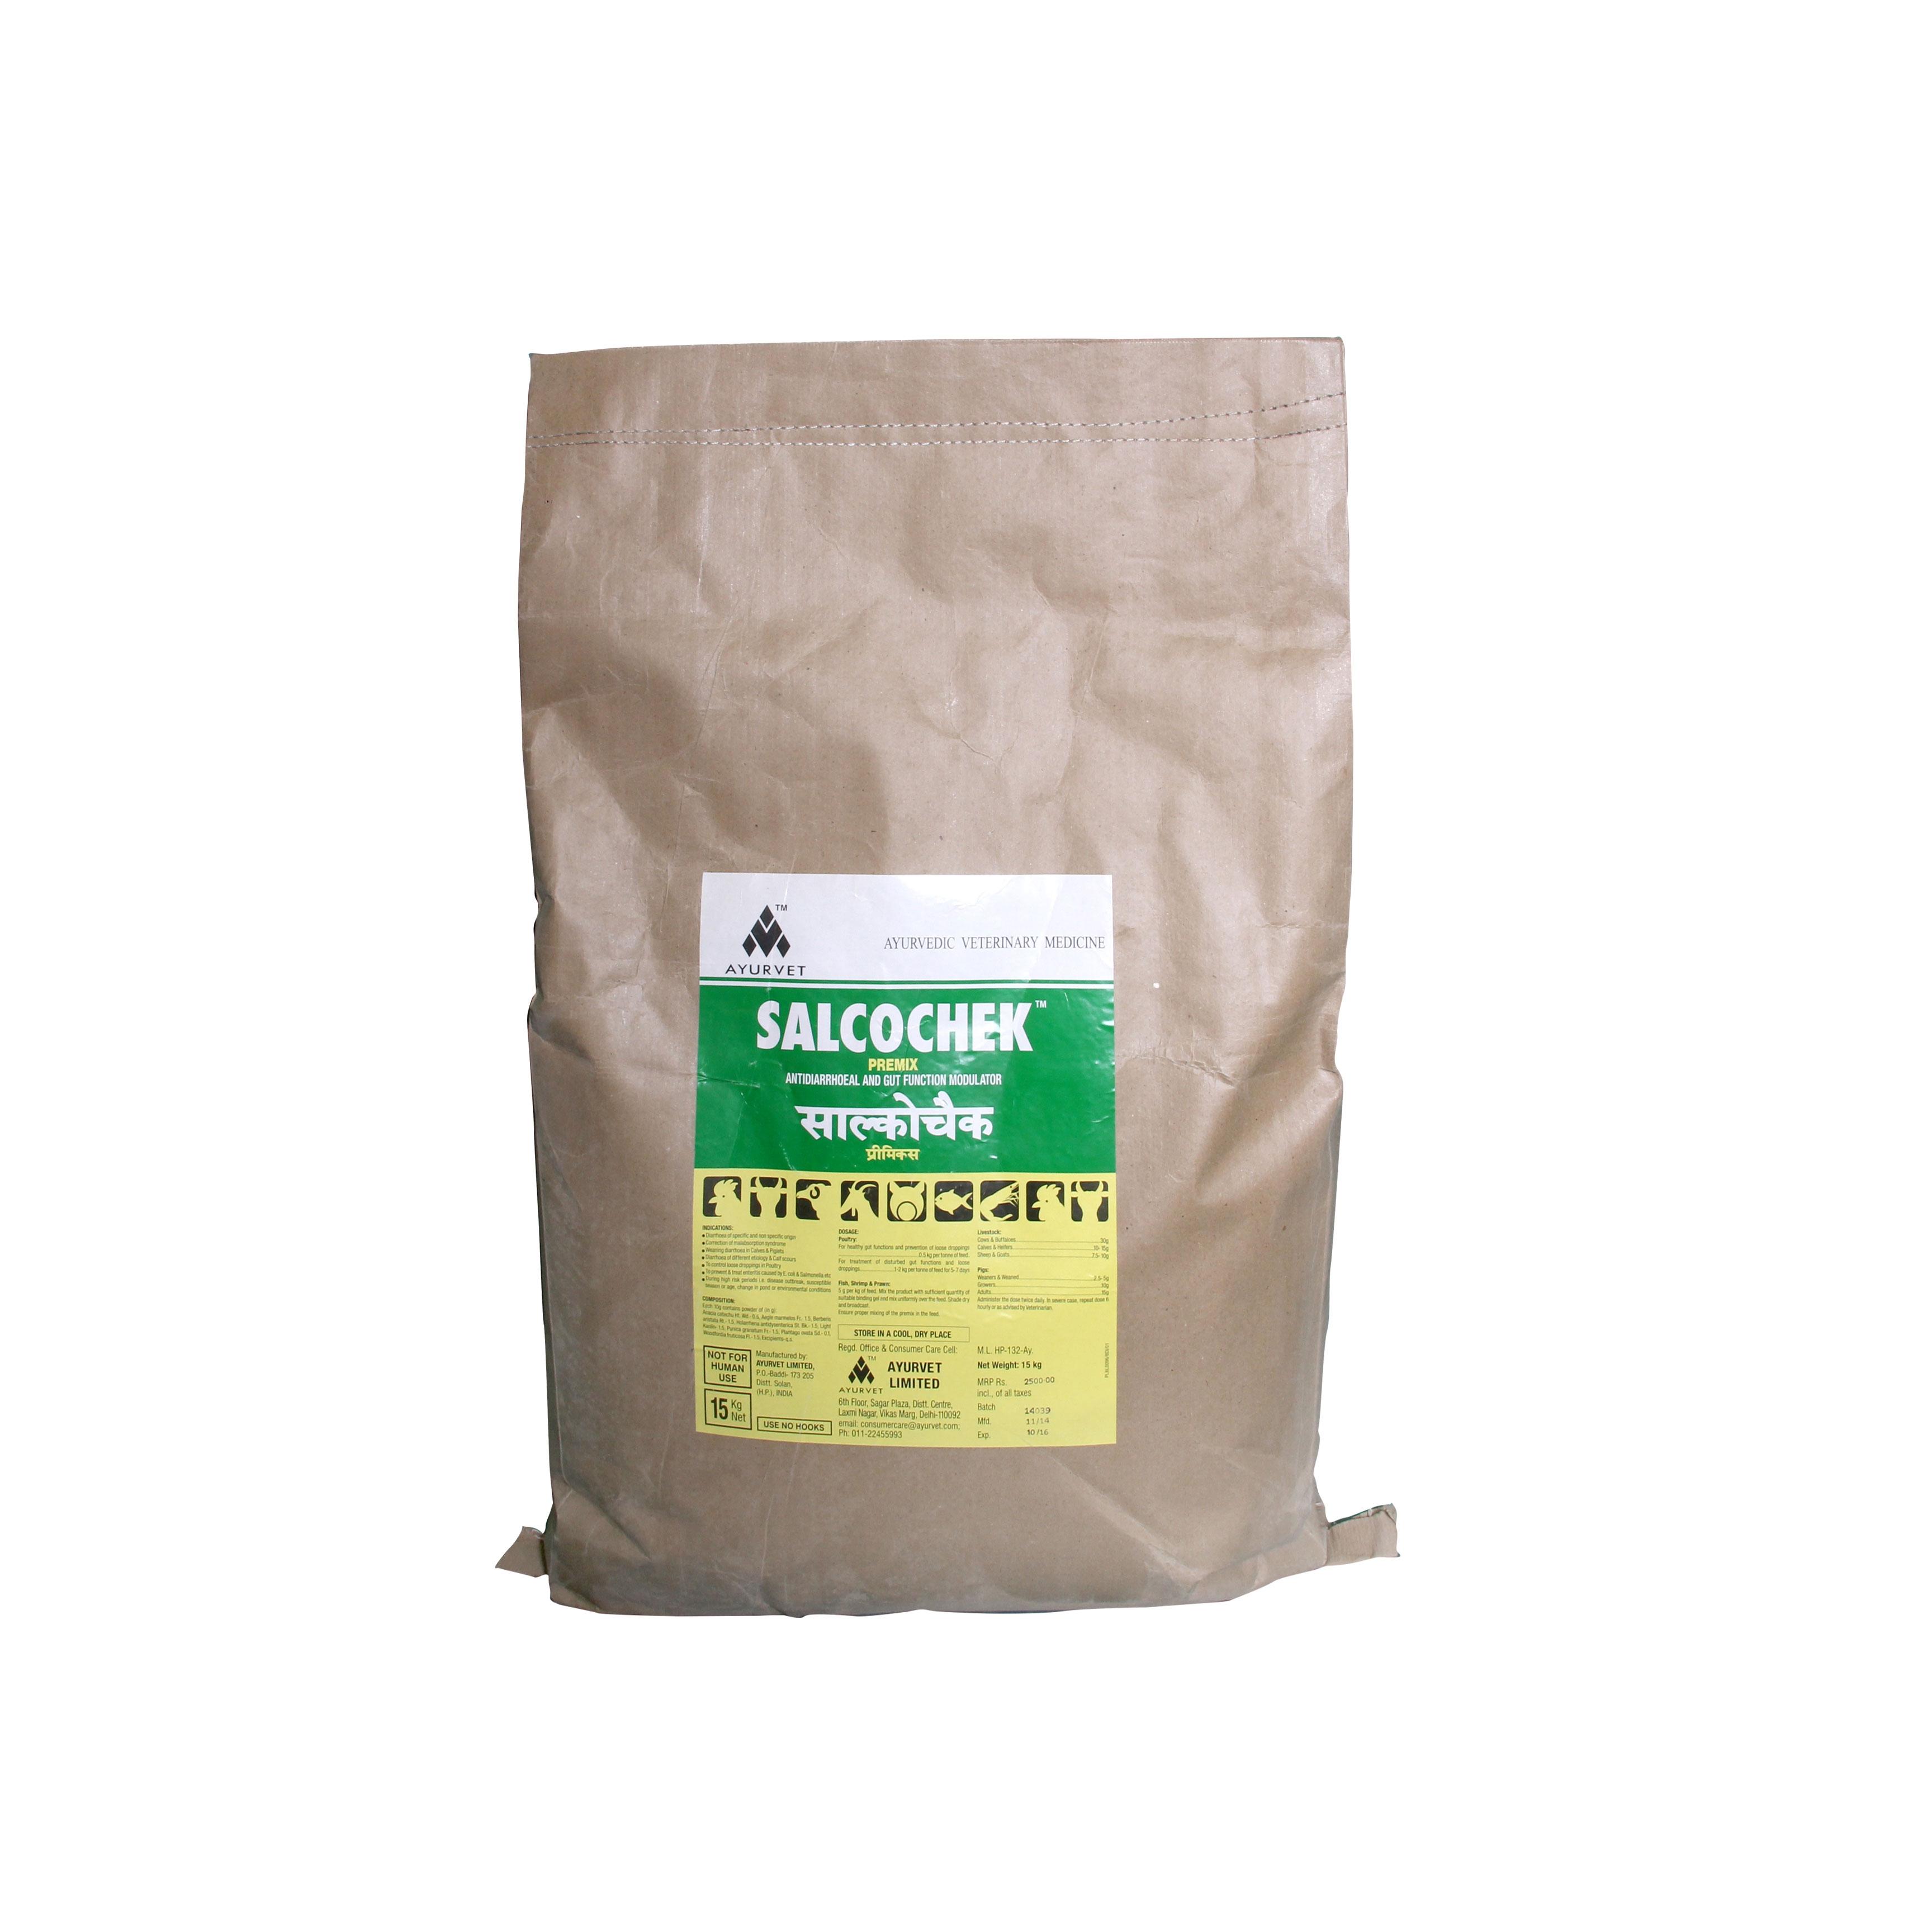 Salcocheck, 1 kg imagine